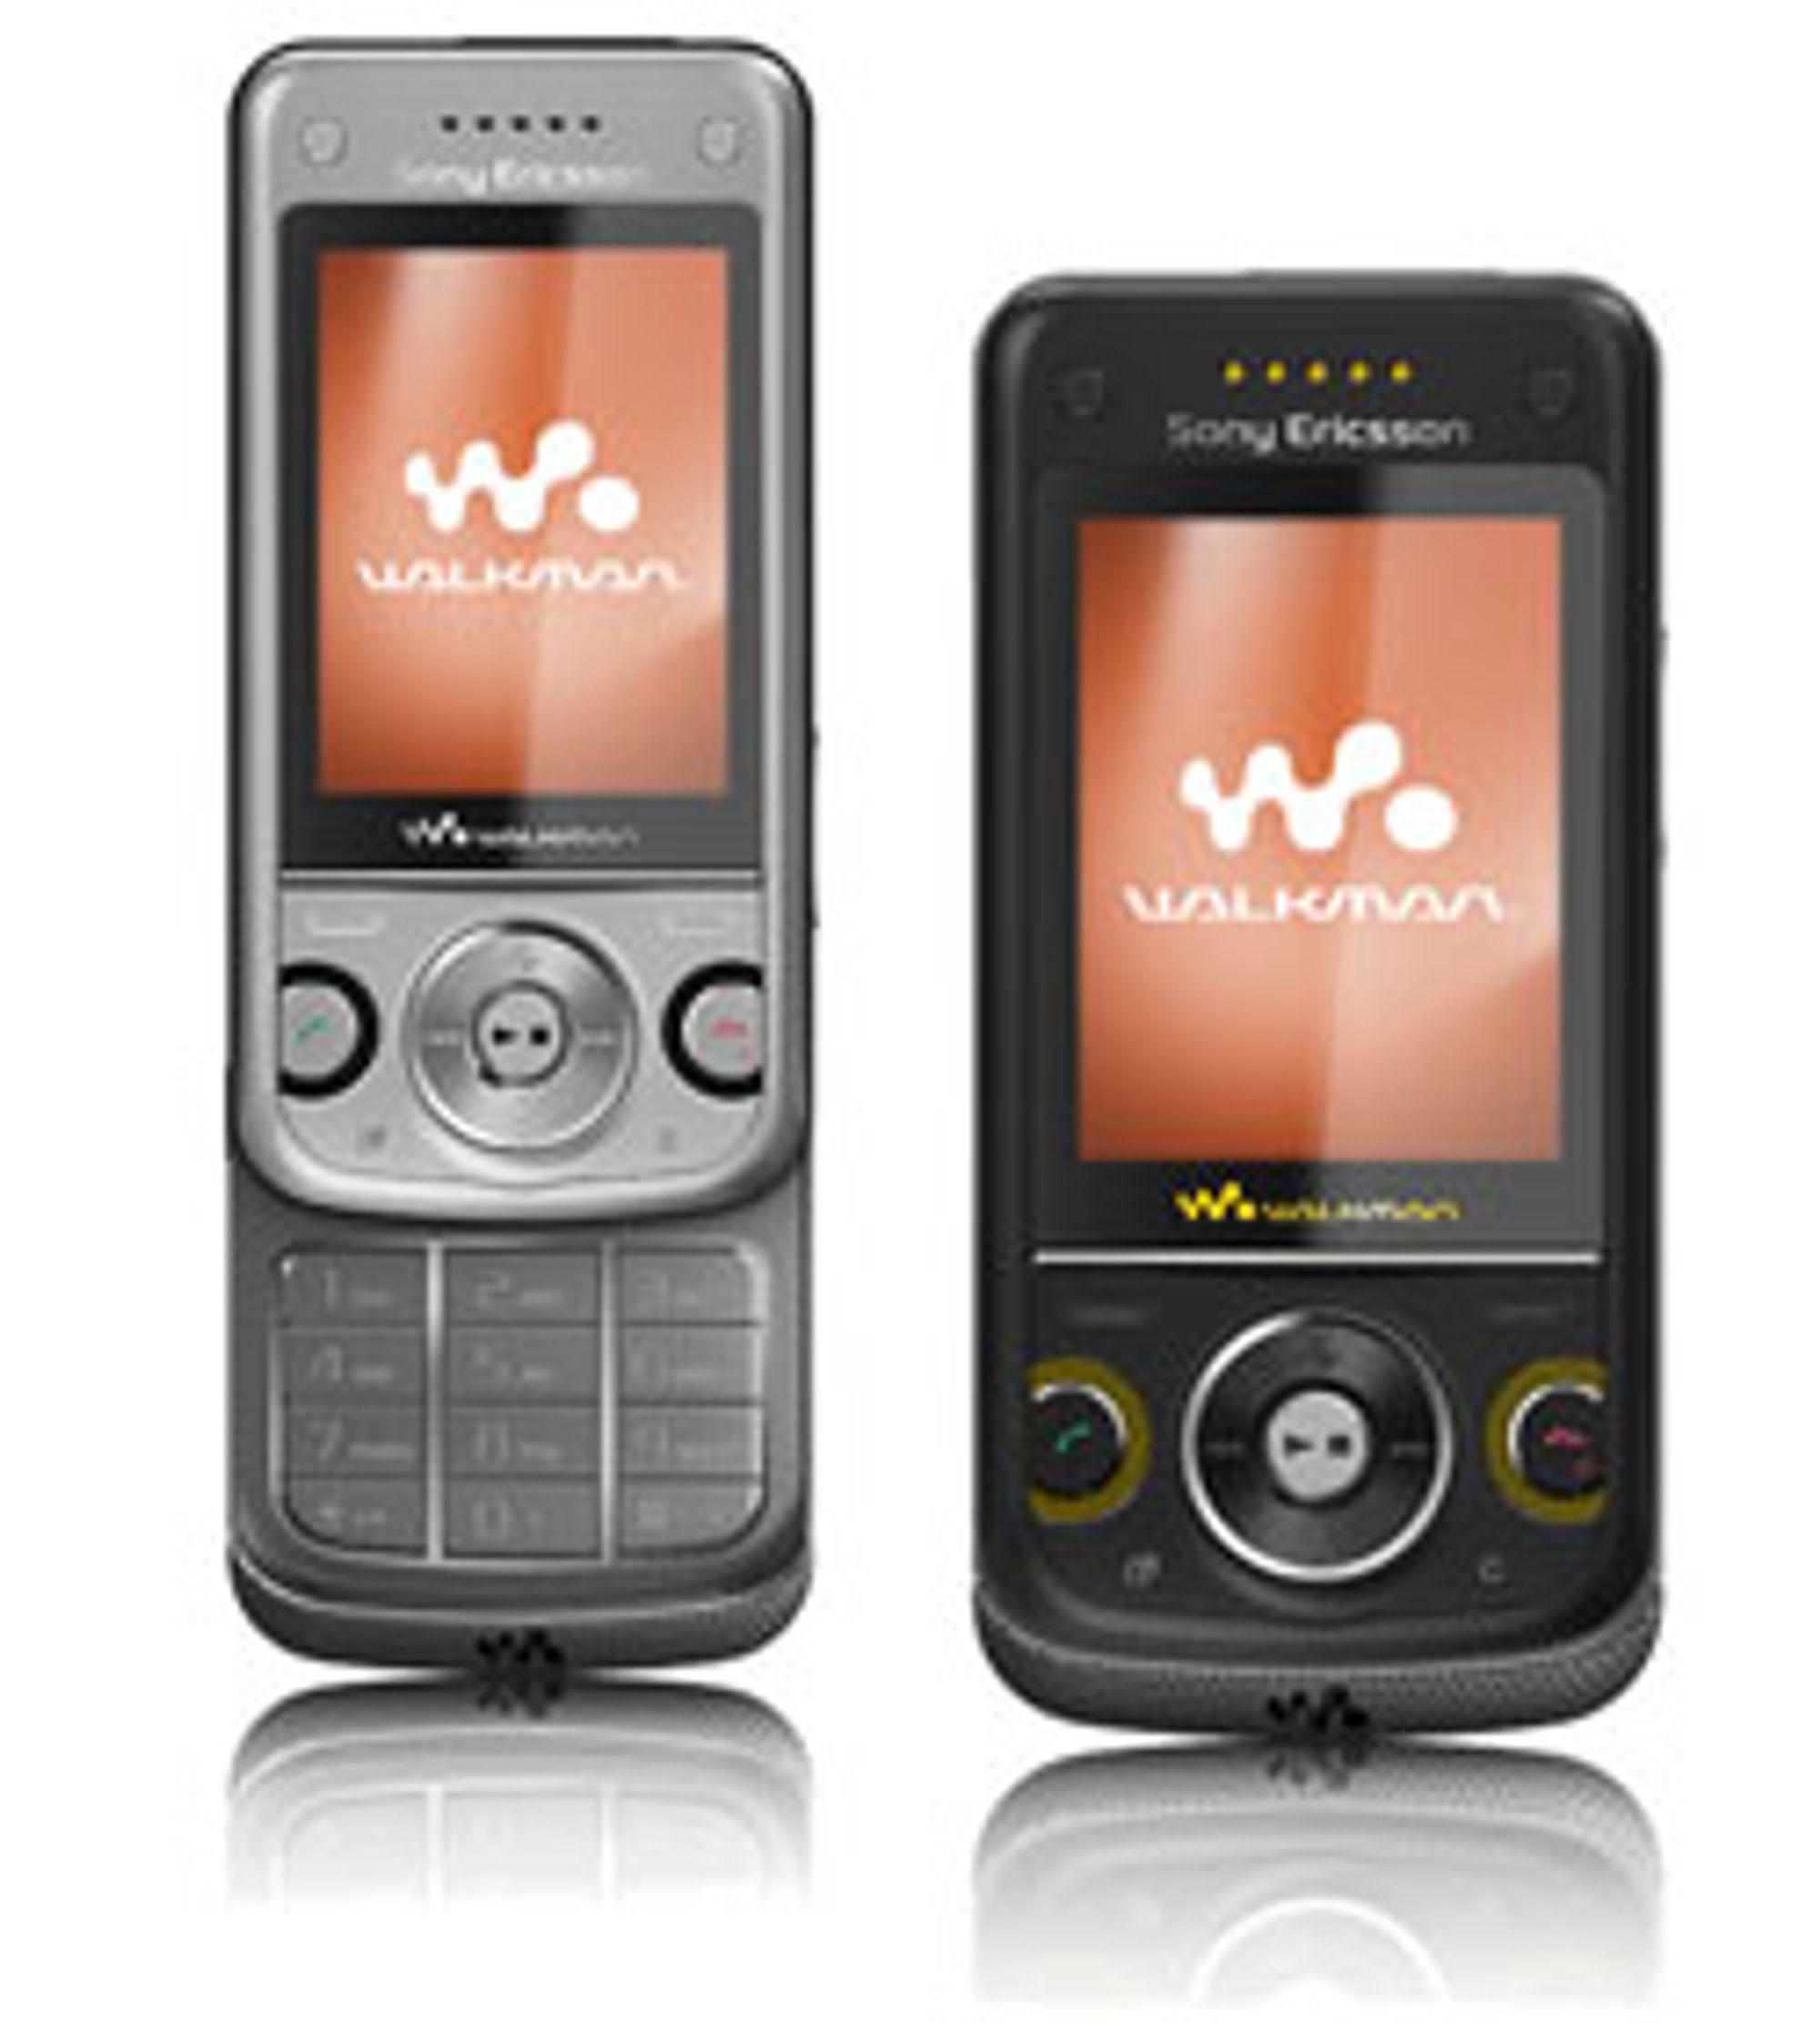 W760i er Sony Ericssons første GPS-Walkman.